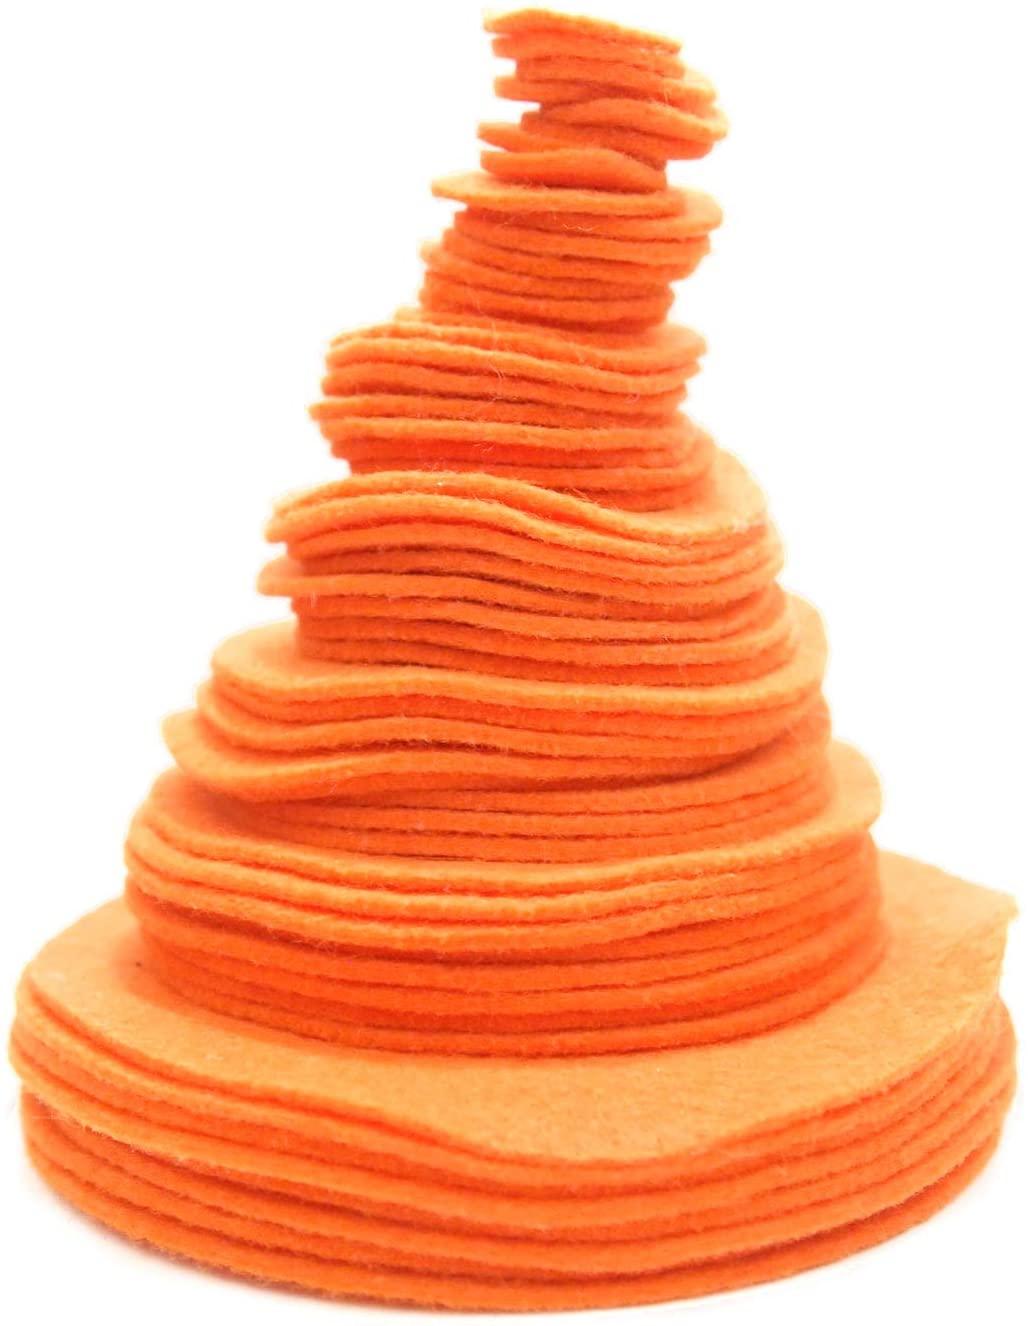 Playfully Ever After Light Orange Craft Felt Circles (Mixed Size Pack - 56pc)